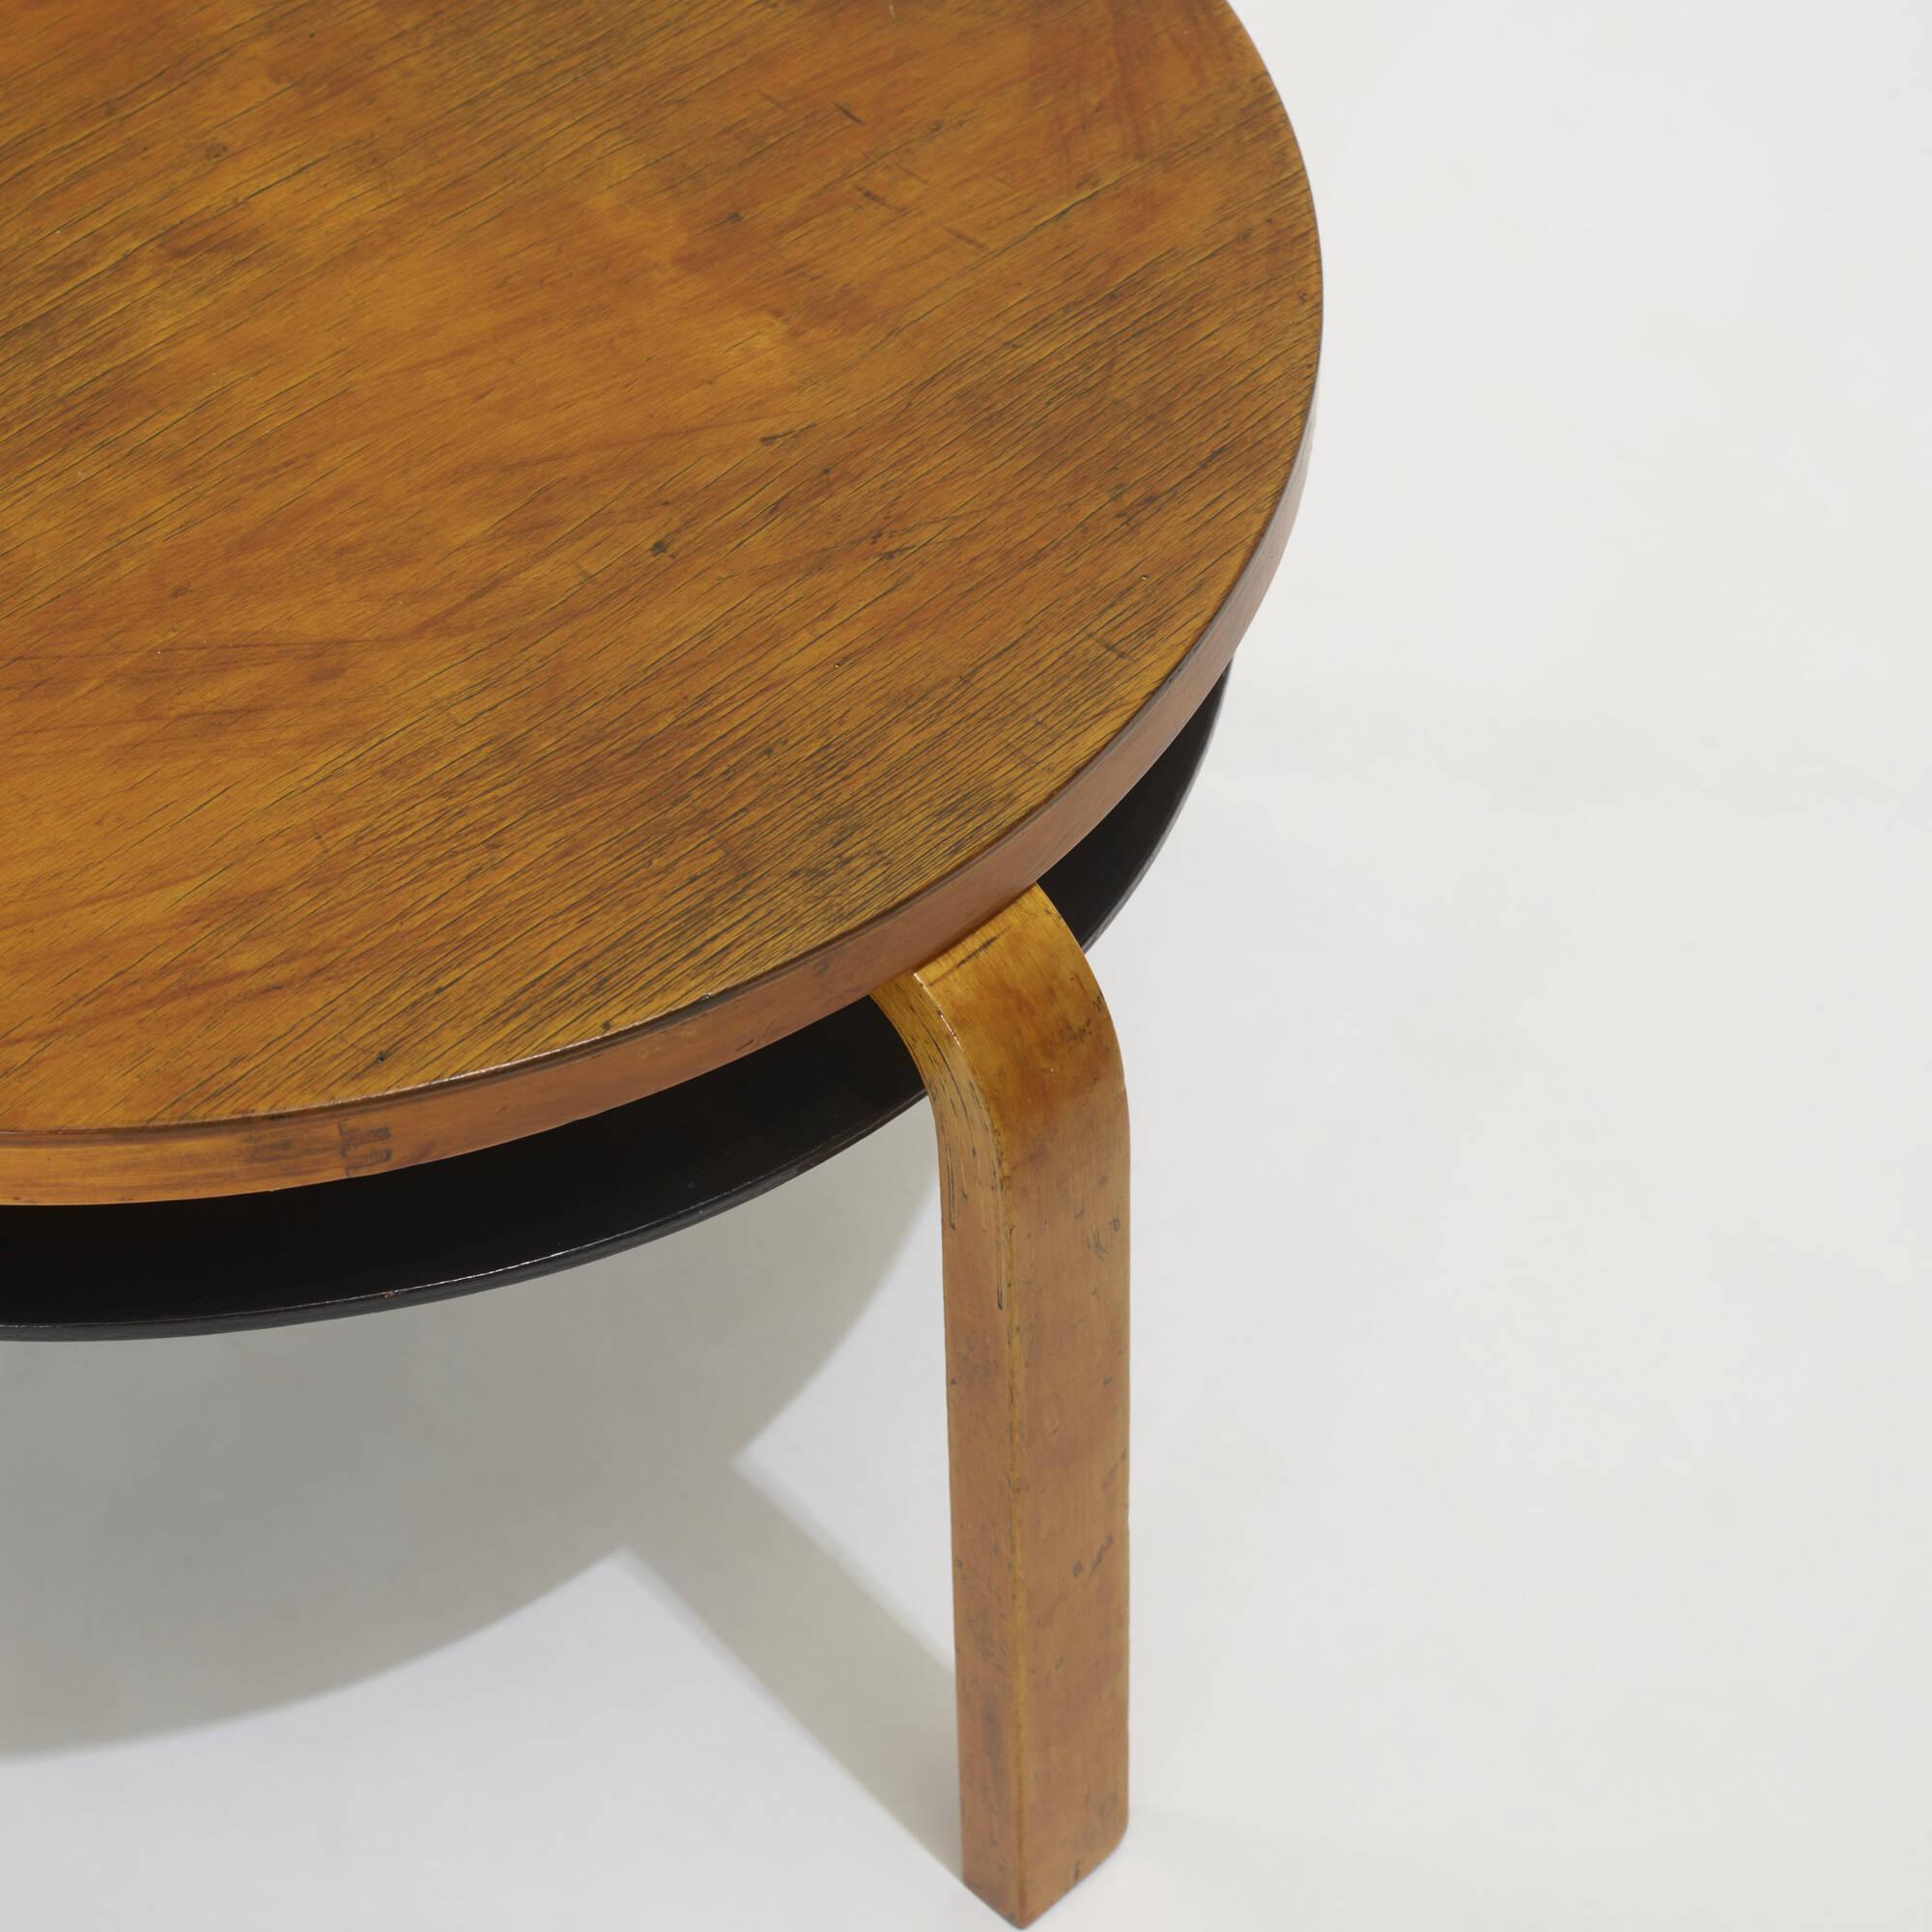 108: Alvar Aalto / coffee table, model 70 (2 of 2)